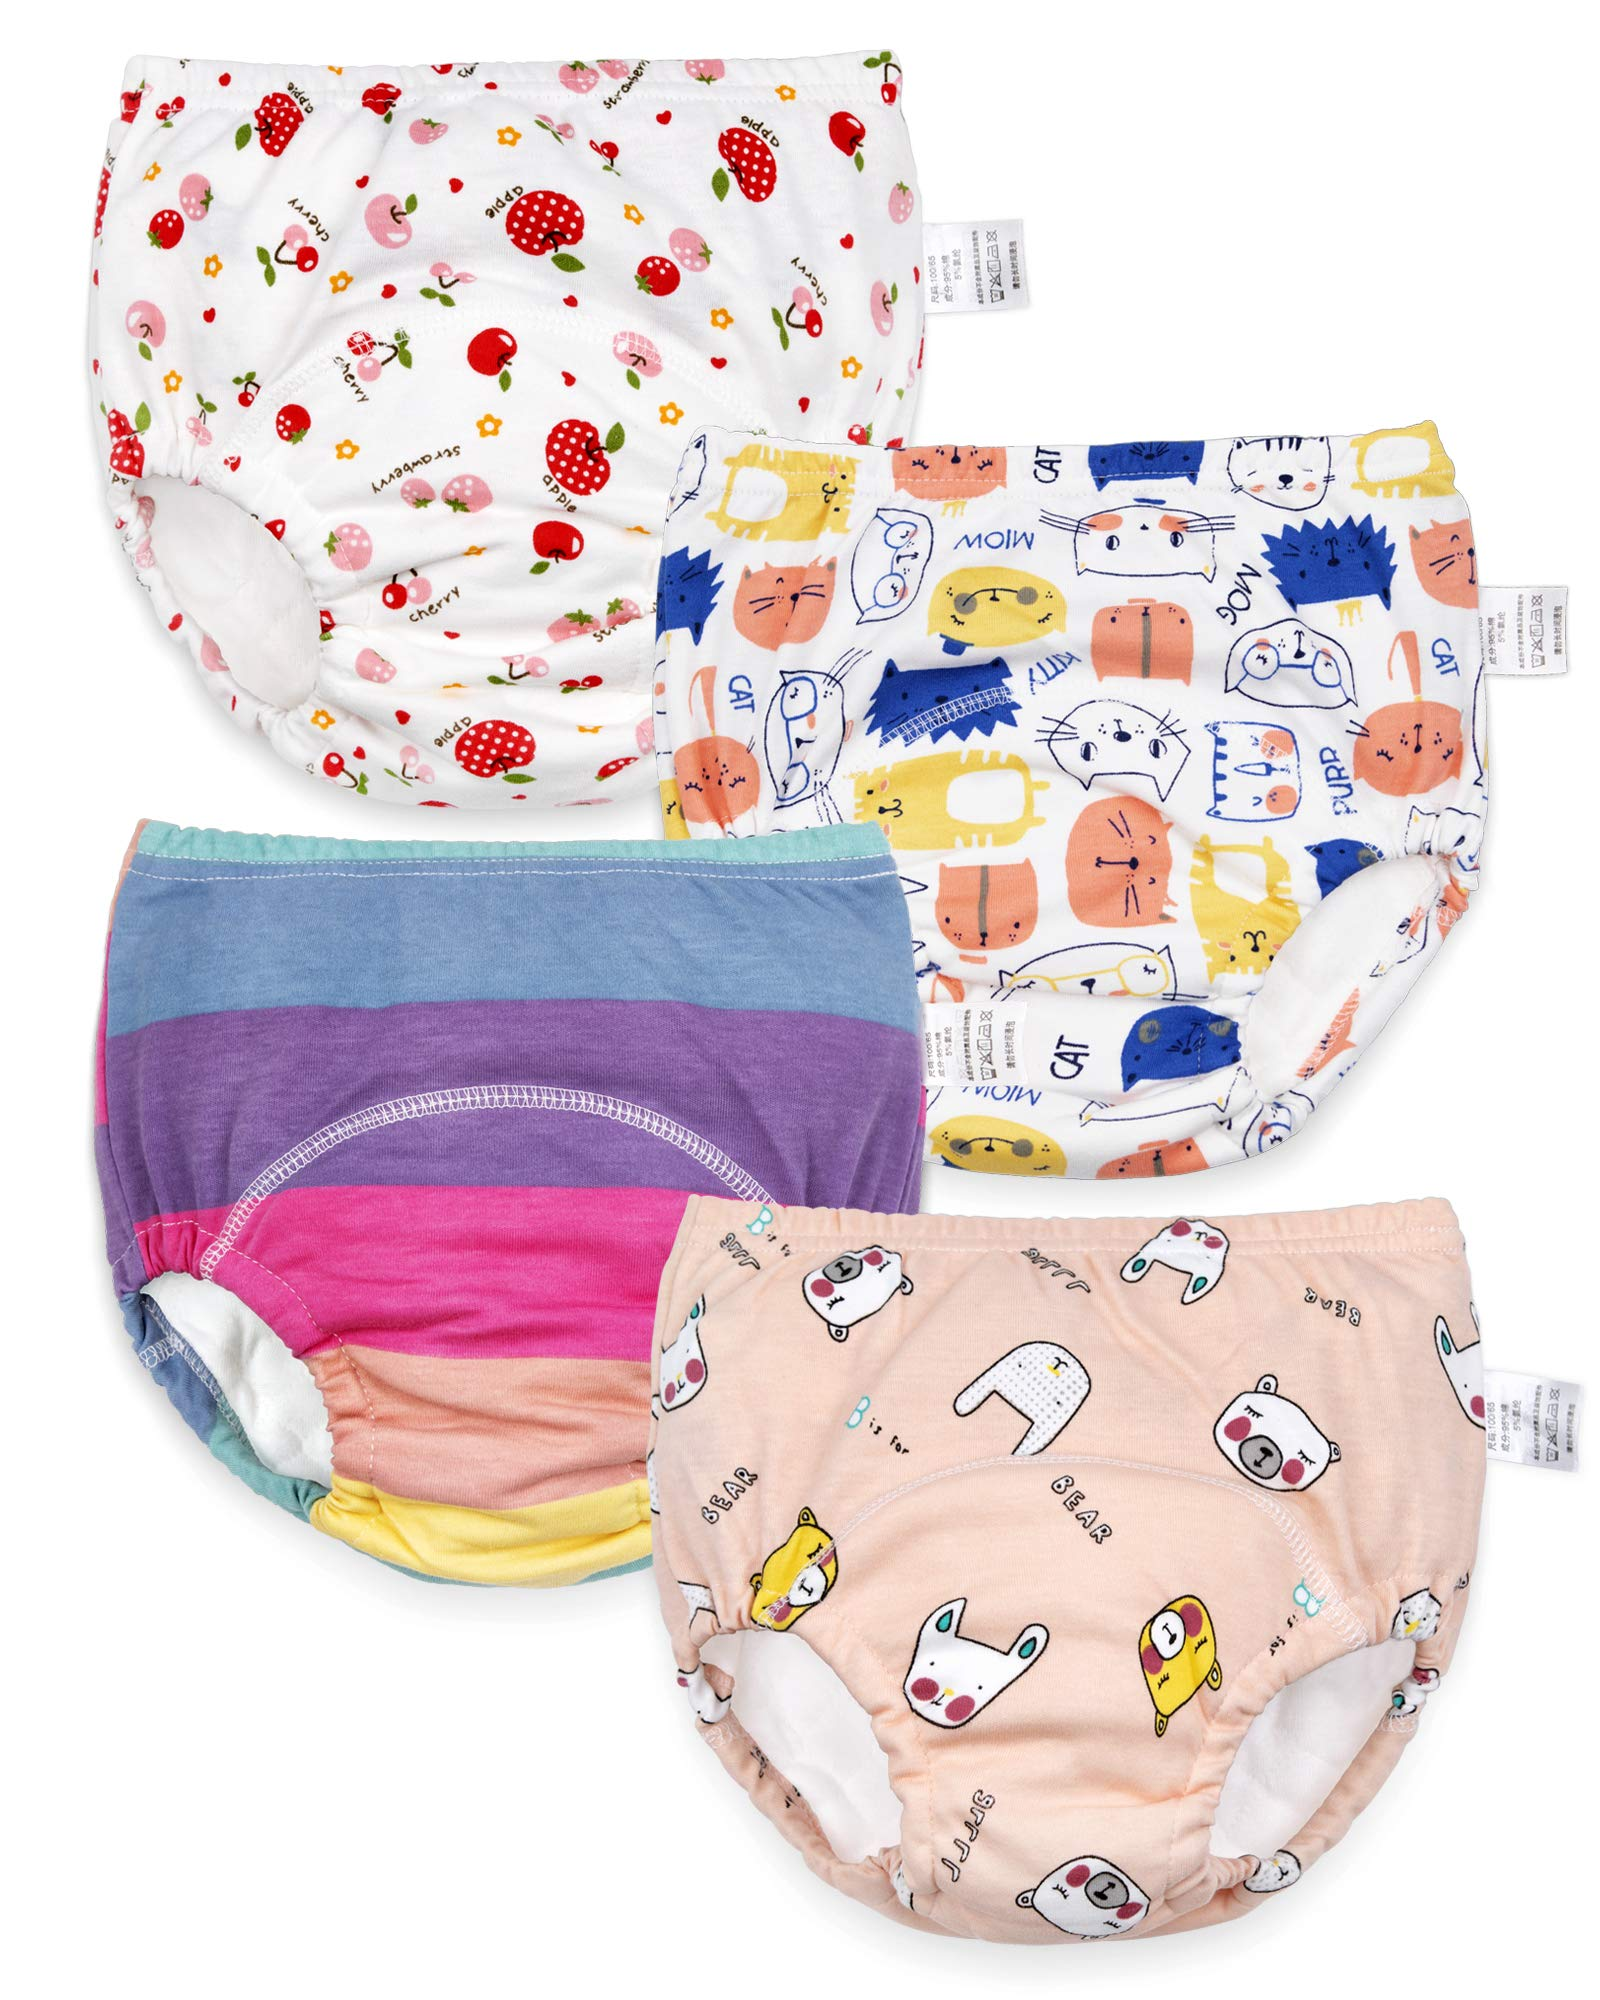 Max Shape 6 Pack Baby Girl Boy Toliet Pee Potty Training Pants Diaper Nappy Underwear